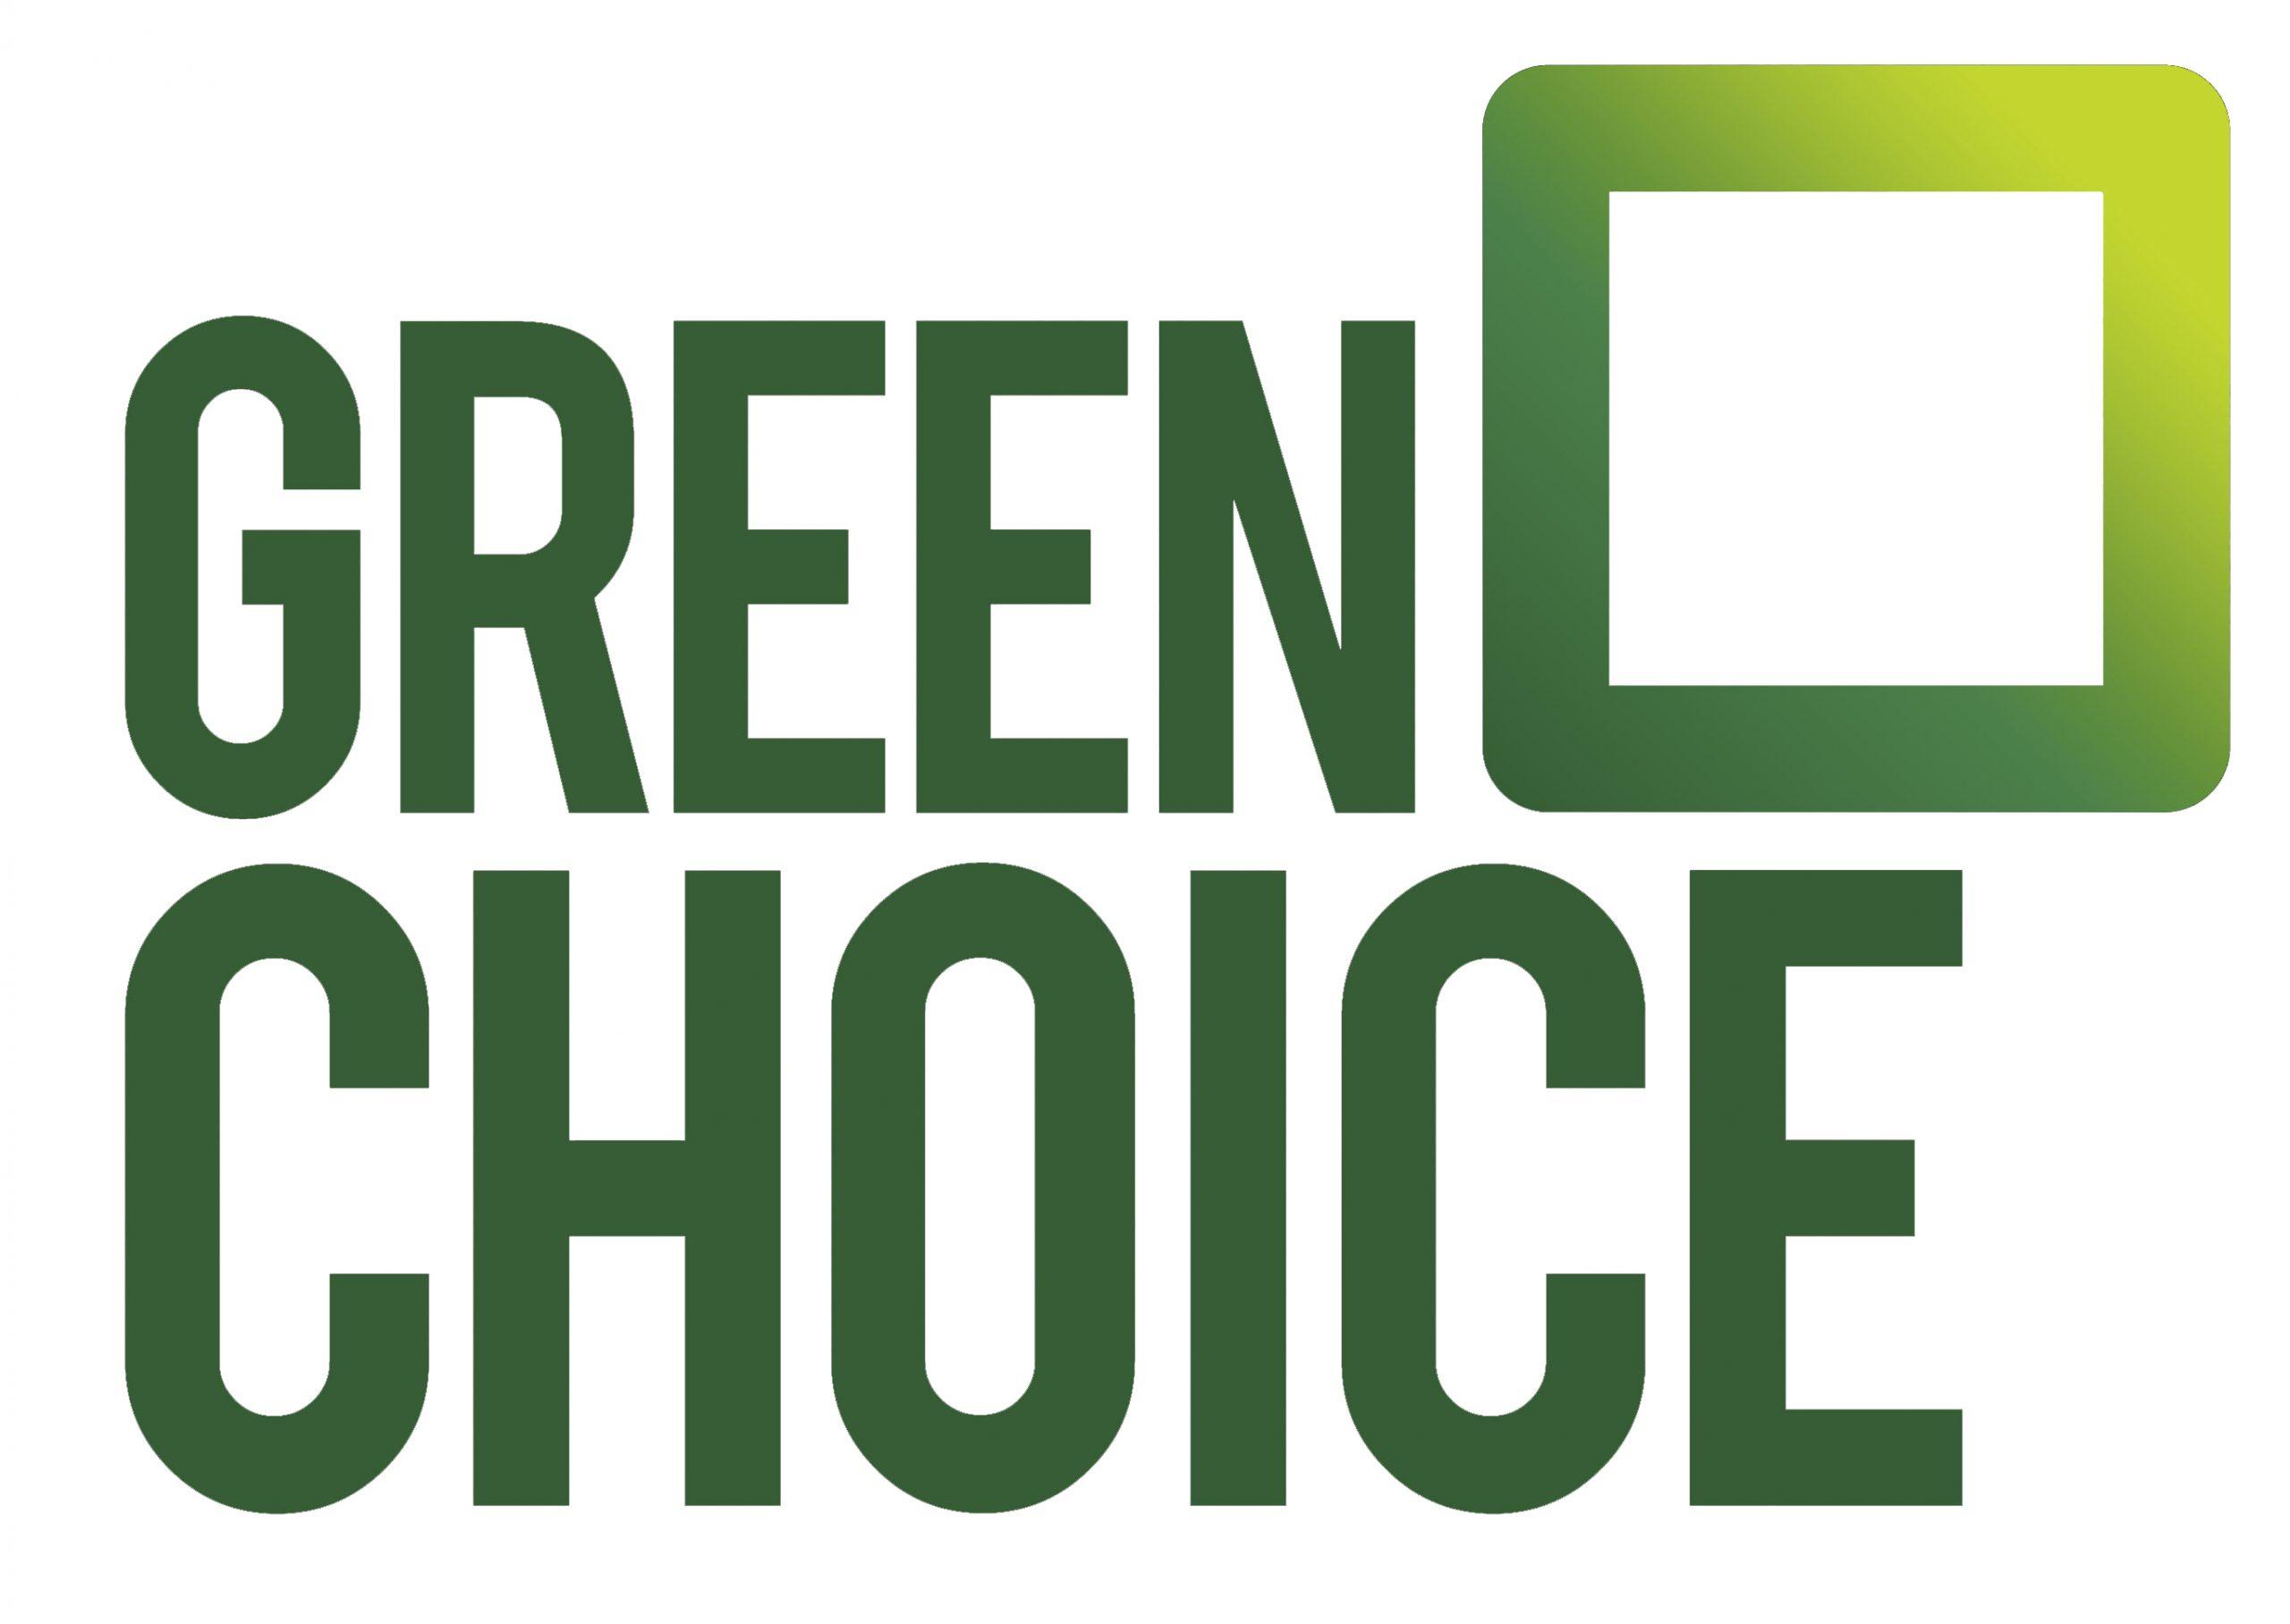 Greenchoice Groene Stroom – Ervaringen, Reviews & Tarieven